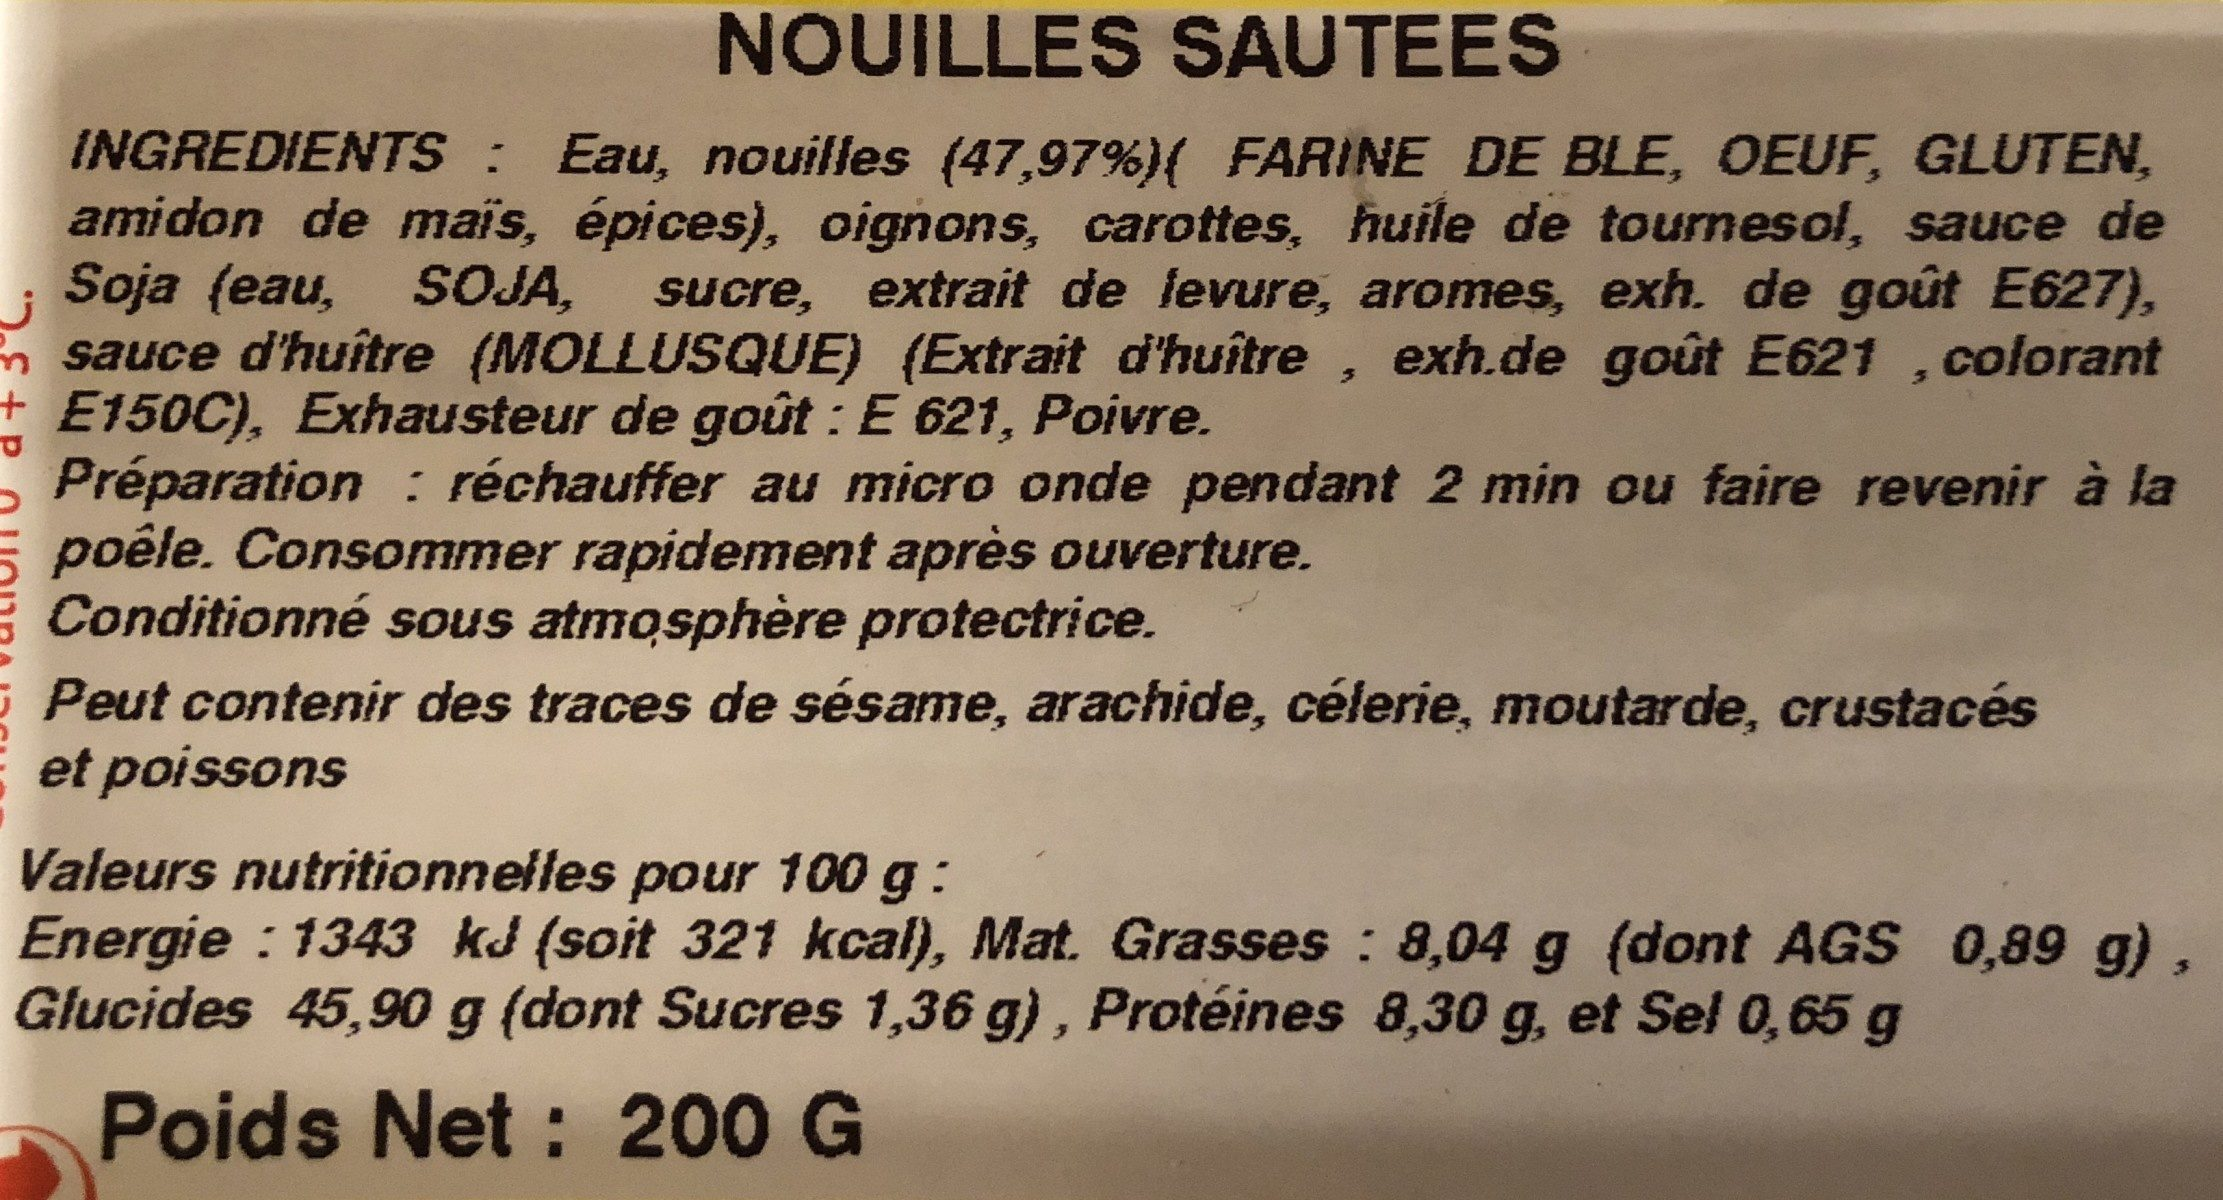 Nouilles Chinoises Sautées 200G - Ingrediënten - fr